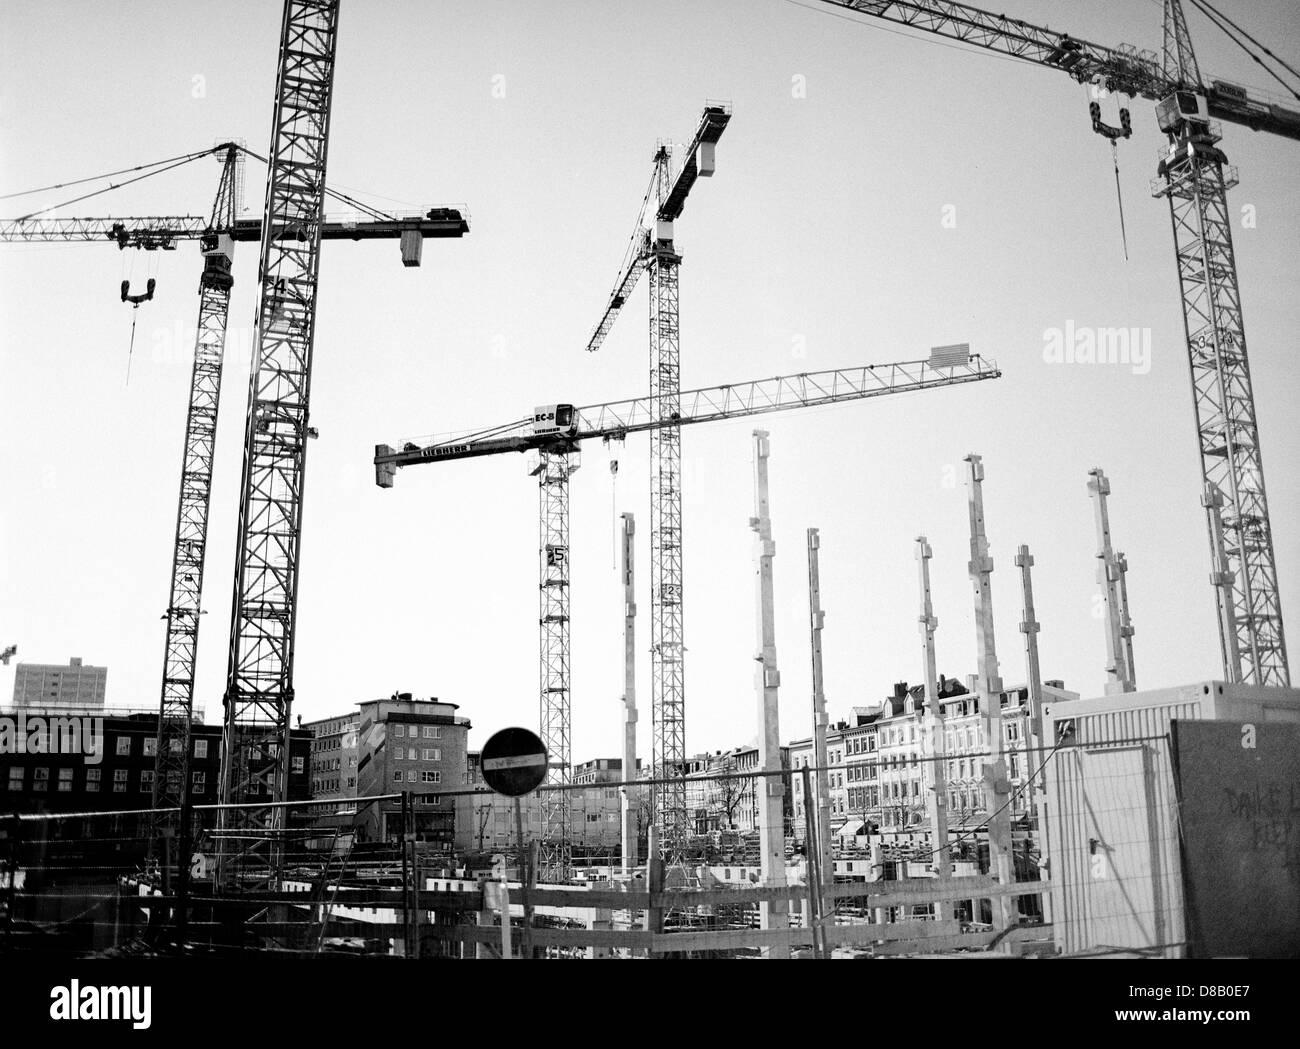 Neue Ikea Filiale In Der Herstellung Baustelle Am Grosse